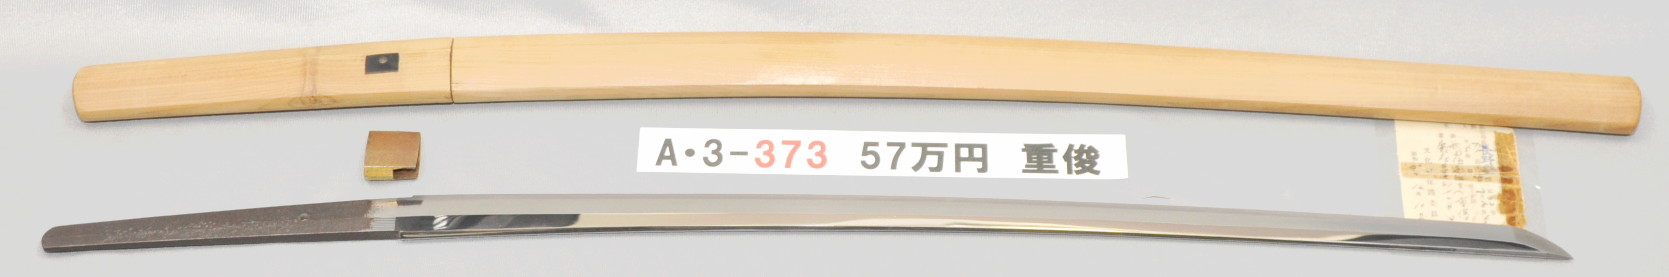 A3373